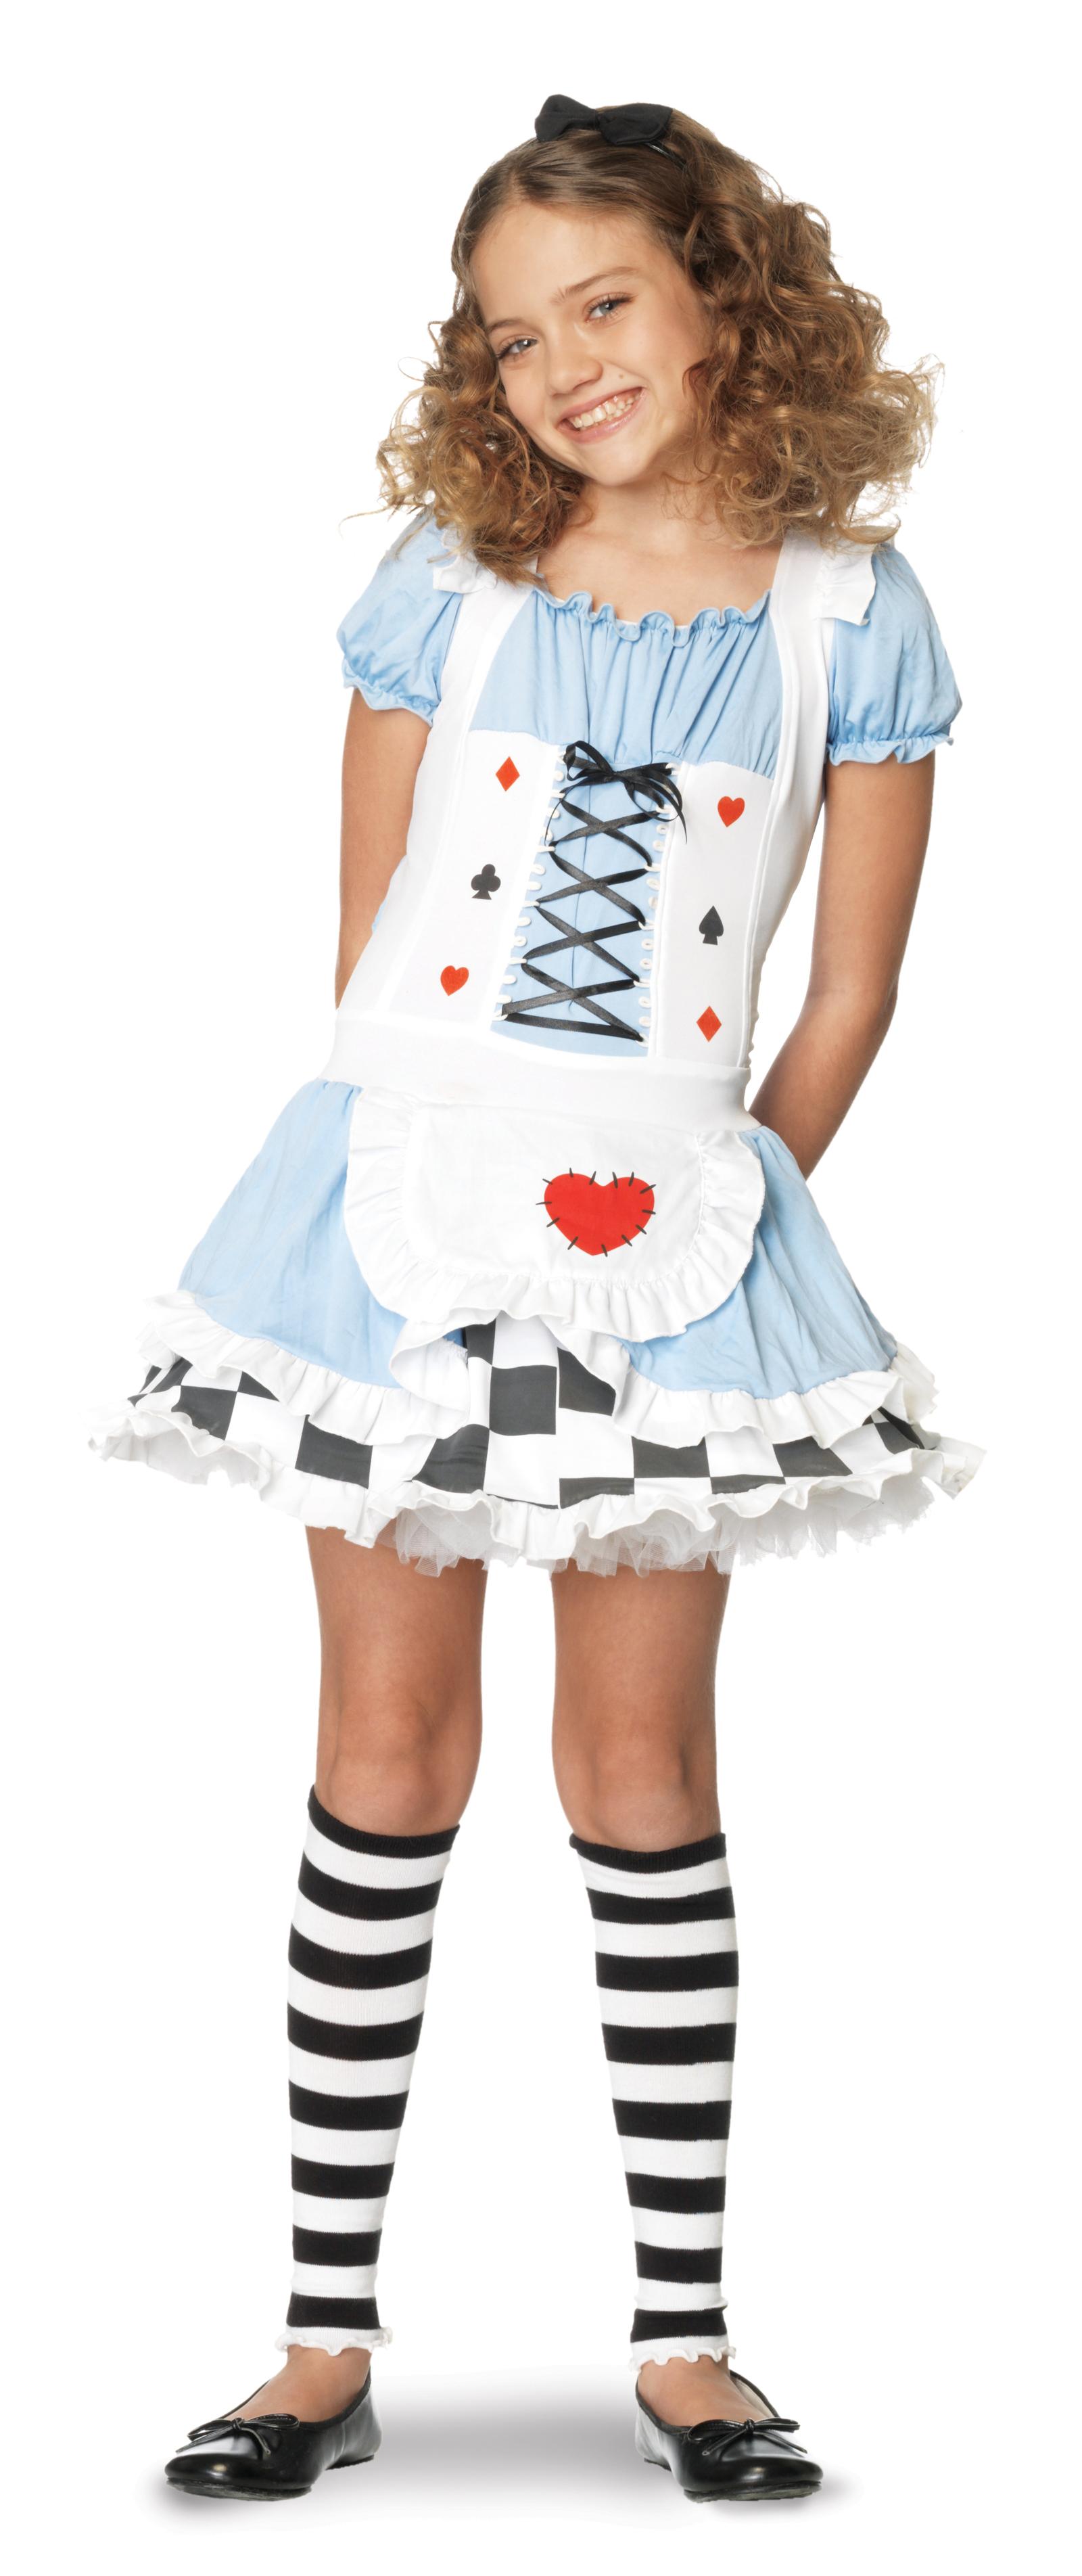 White apron alice wonderland costume - White Apron Alice Wonderland Costume 52